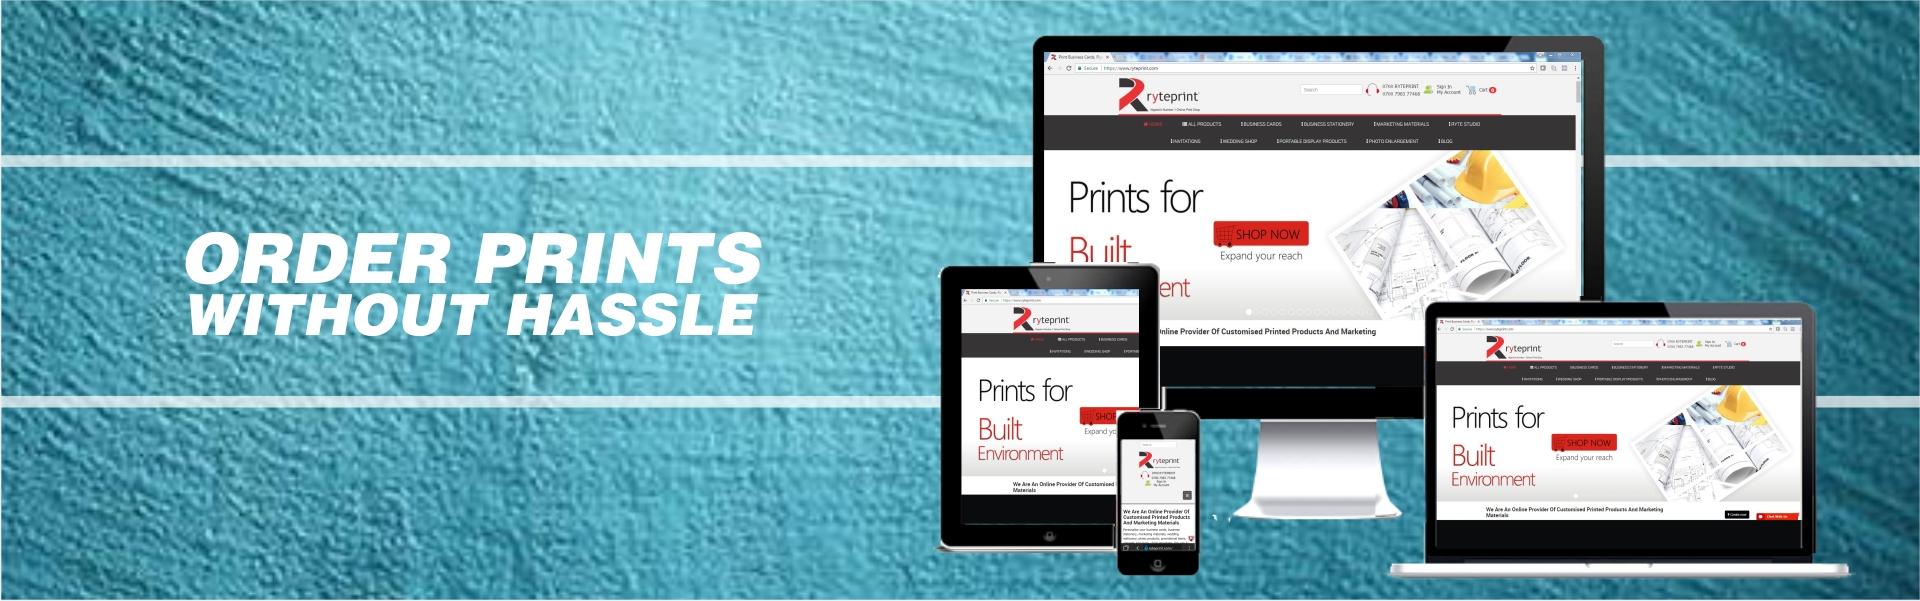 Order Print